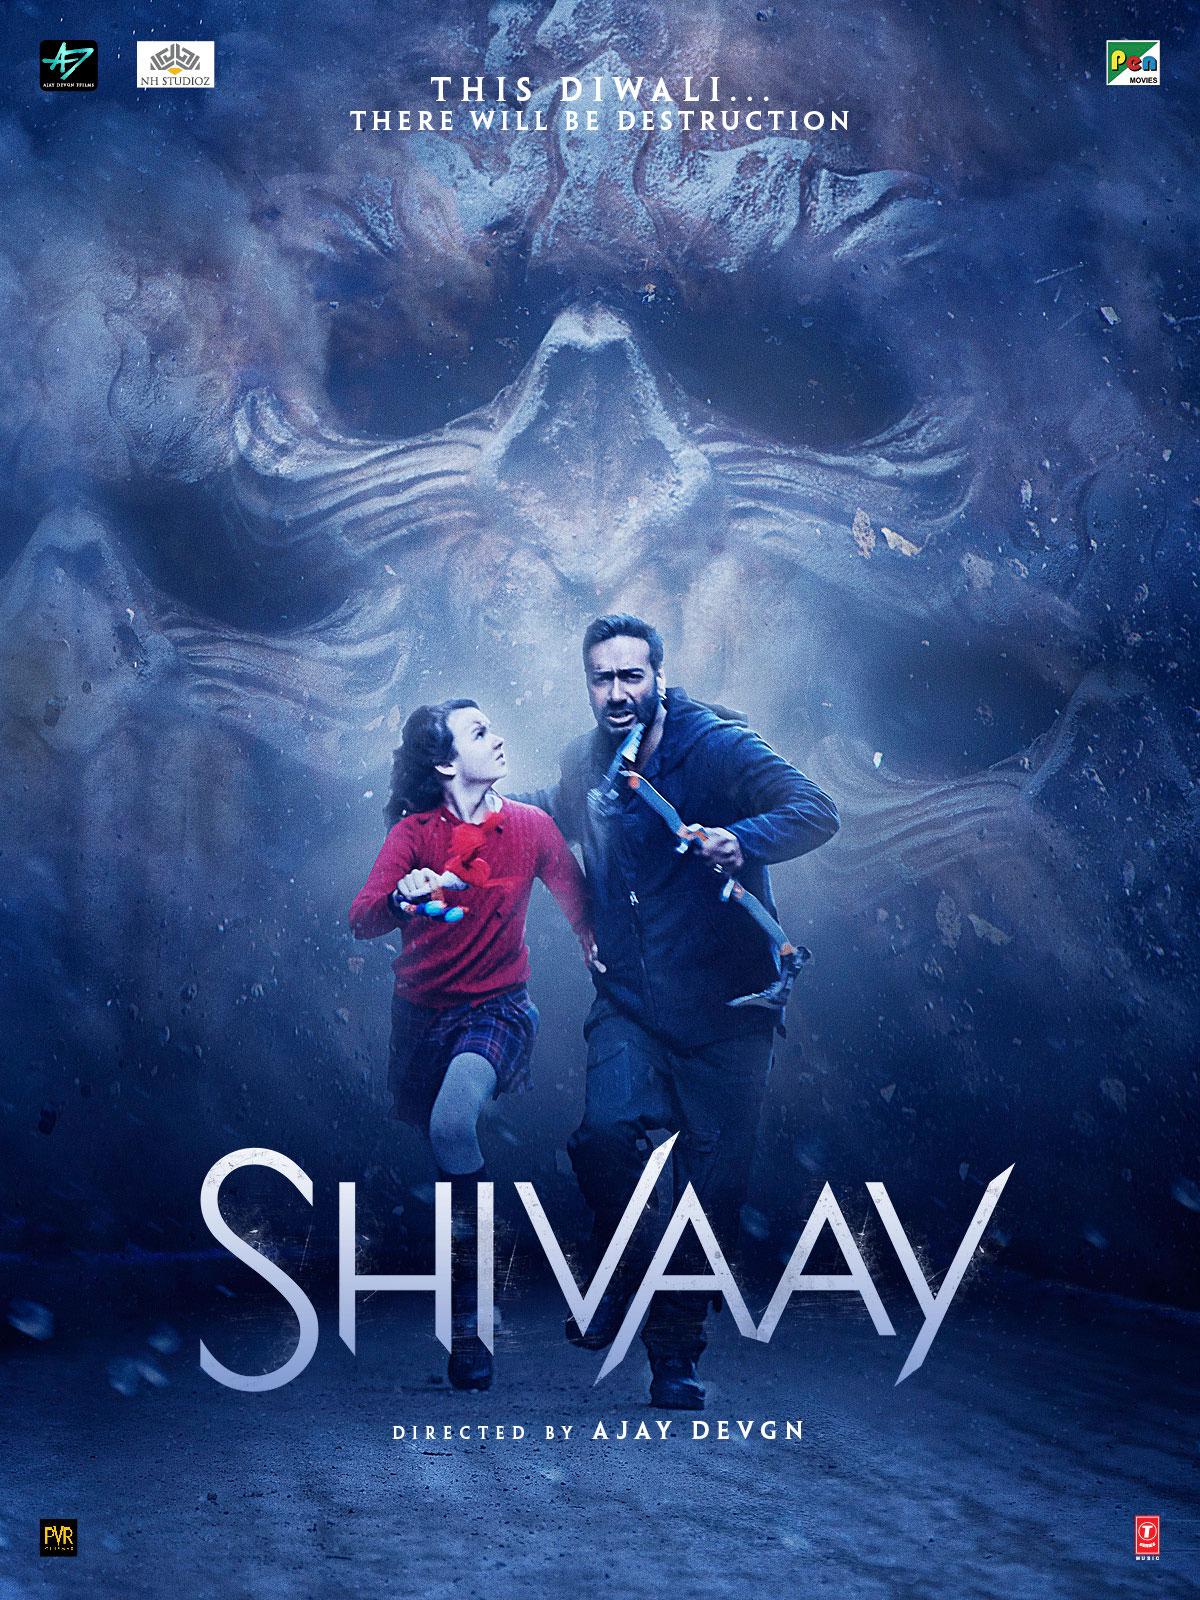 Shivaay (2016) Hindi Full Movie WEB-DL x264 400MB Download